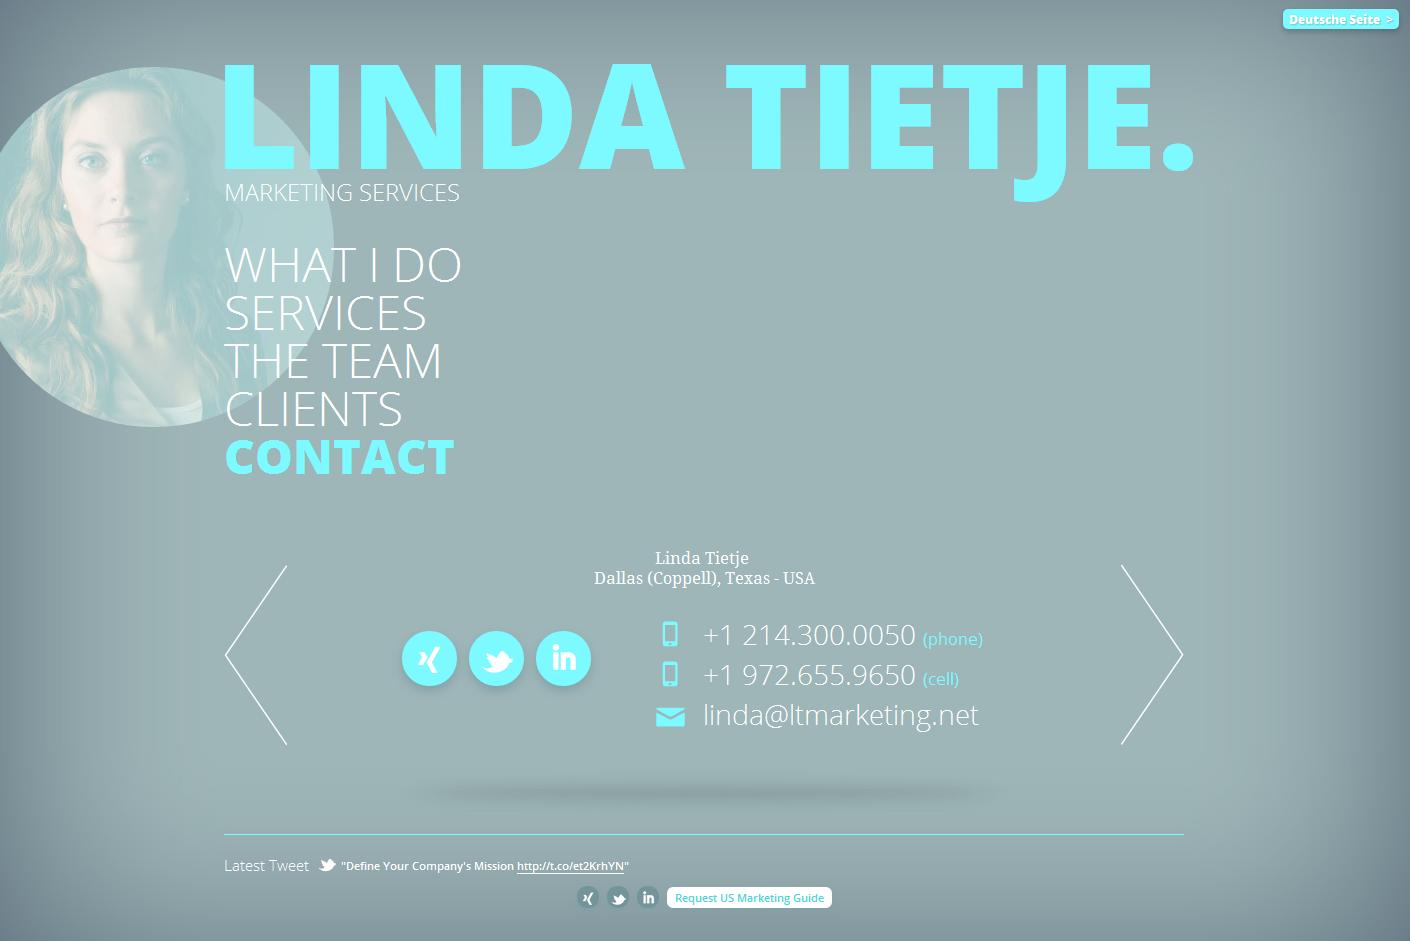 Linda Tietje. Marketing Services. Big Screenshot